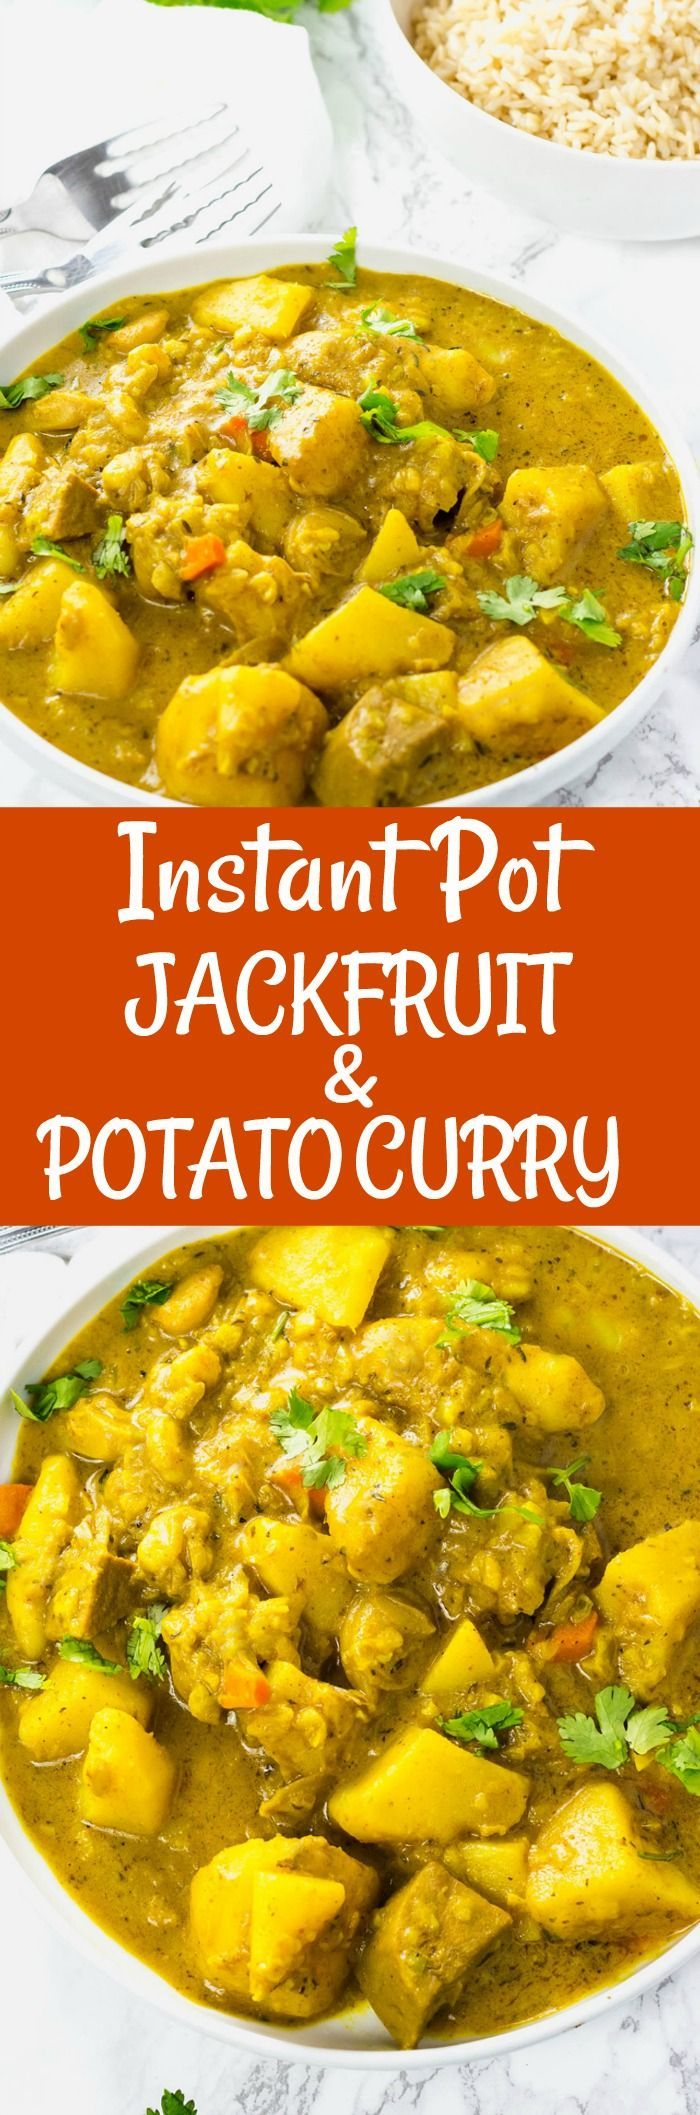 Instant Pot Jackfruit and Potato Curry #vegan #gluten-free #jackfruit